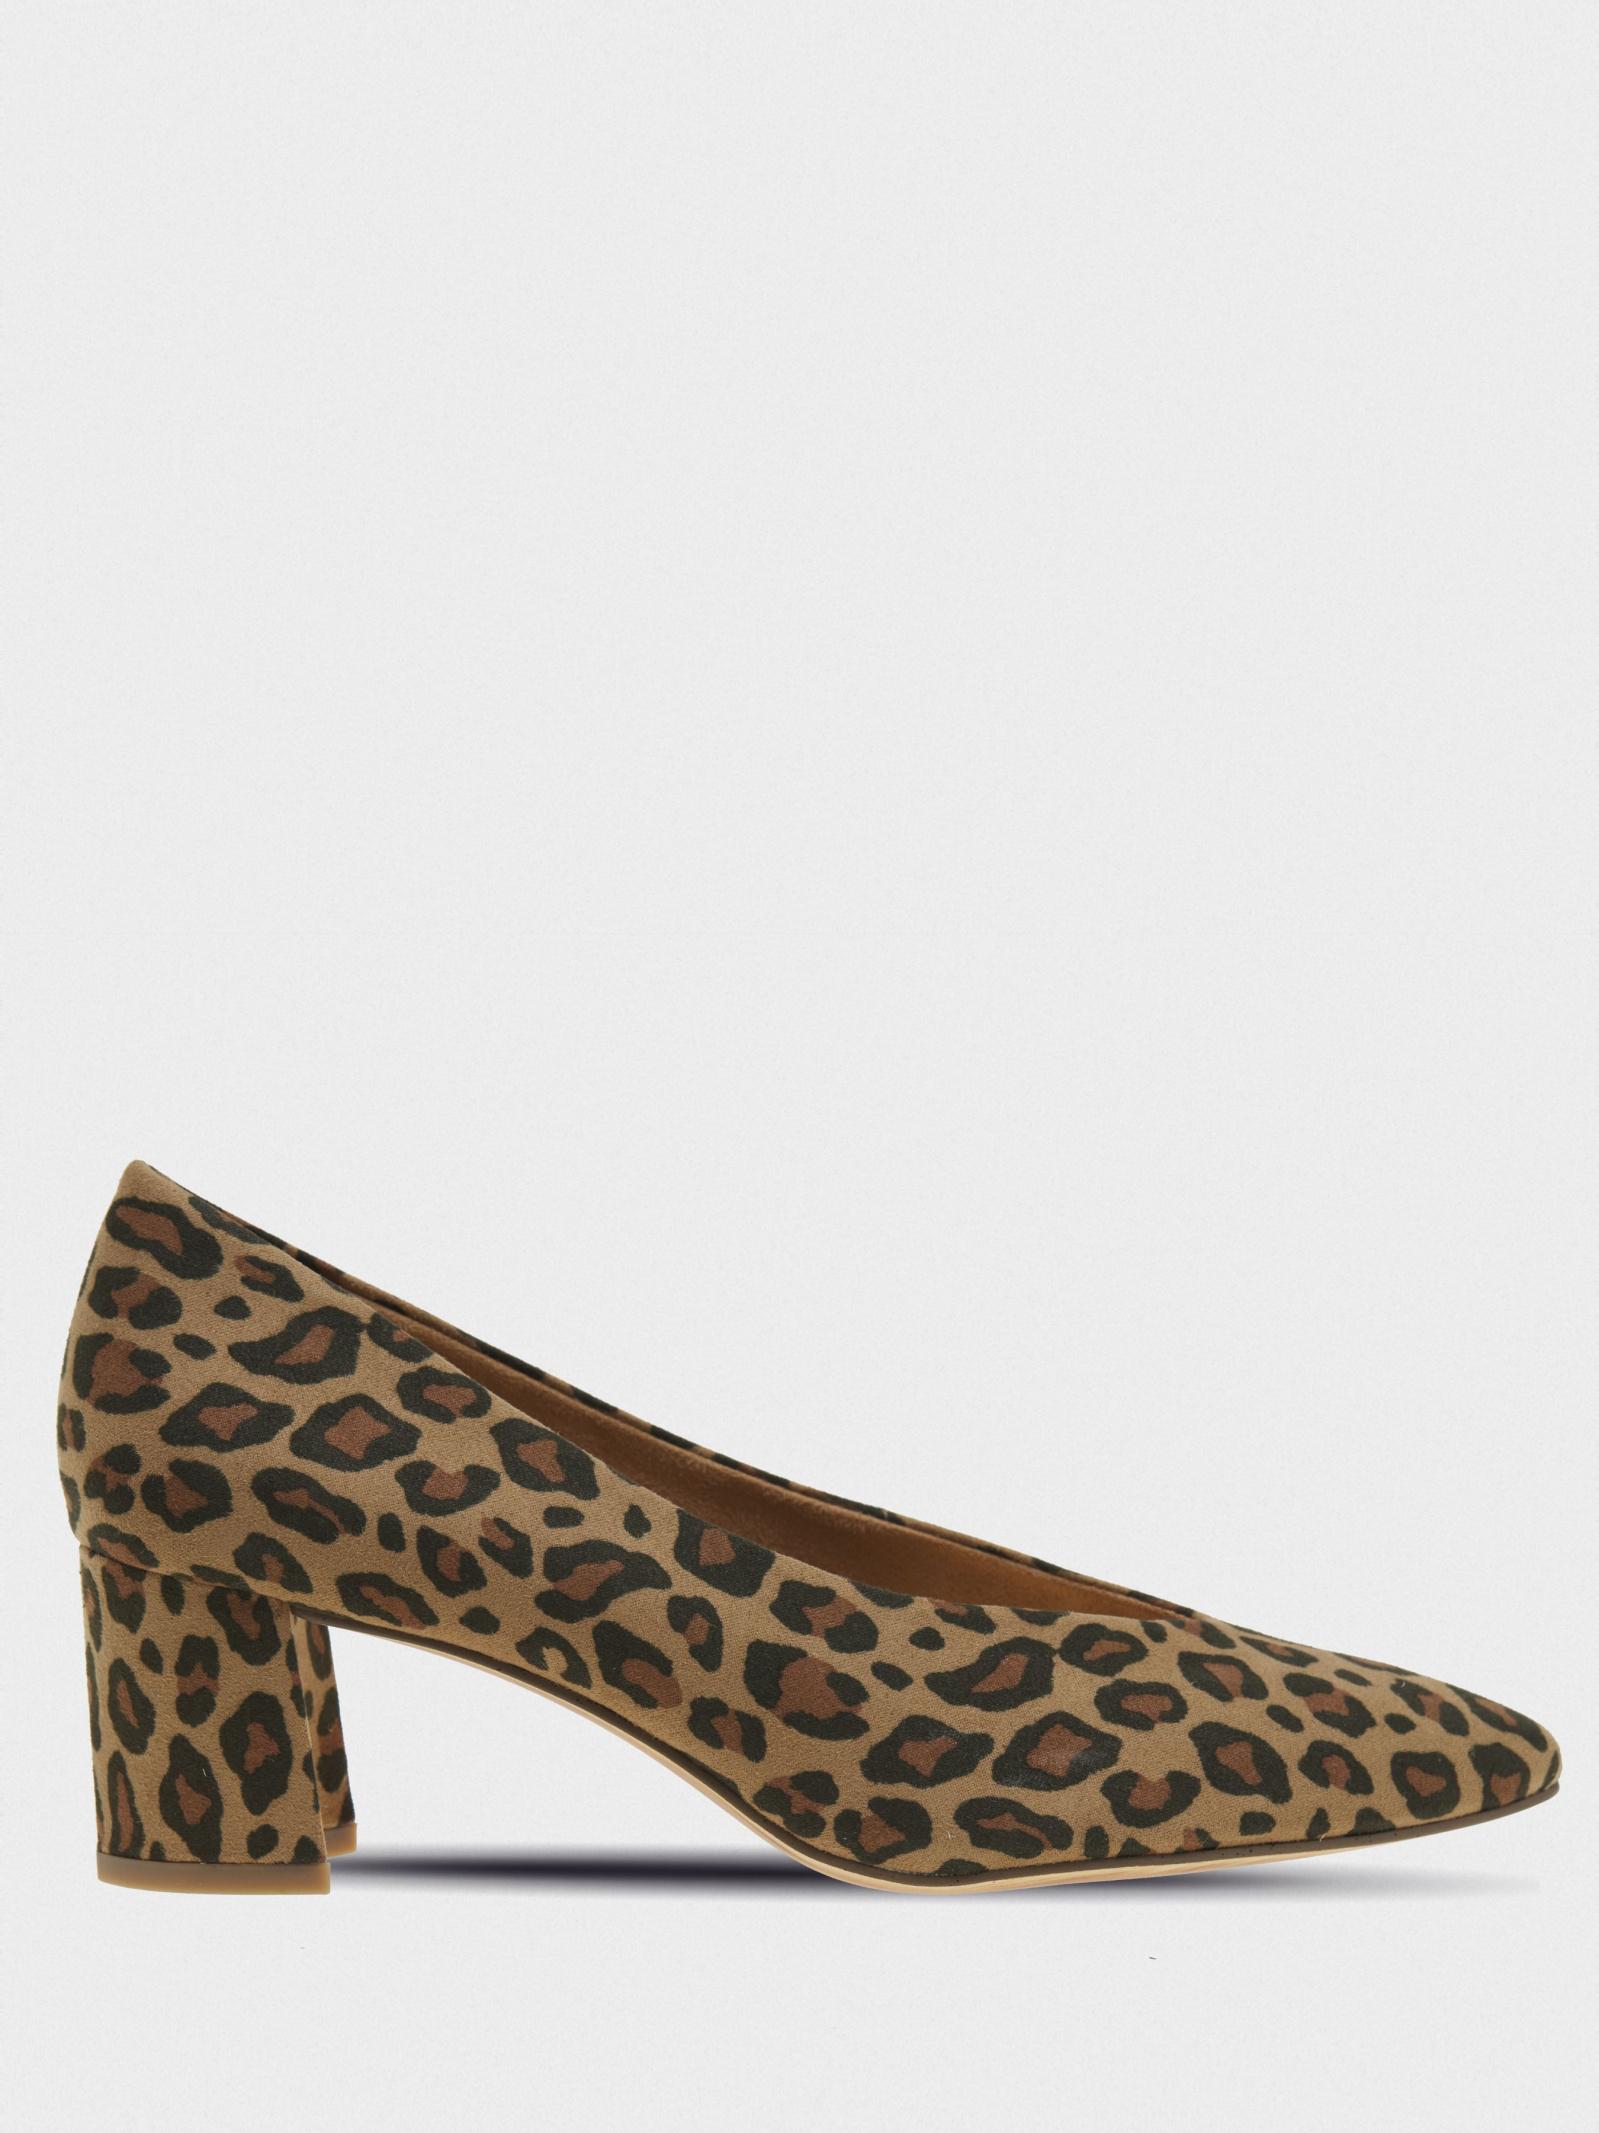 Туфли женские Marco Tozzi 3H340 цена, 2017